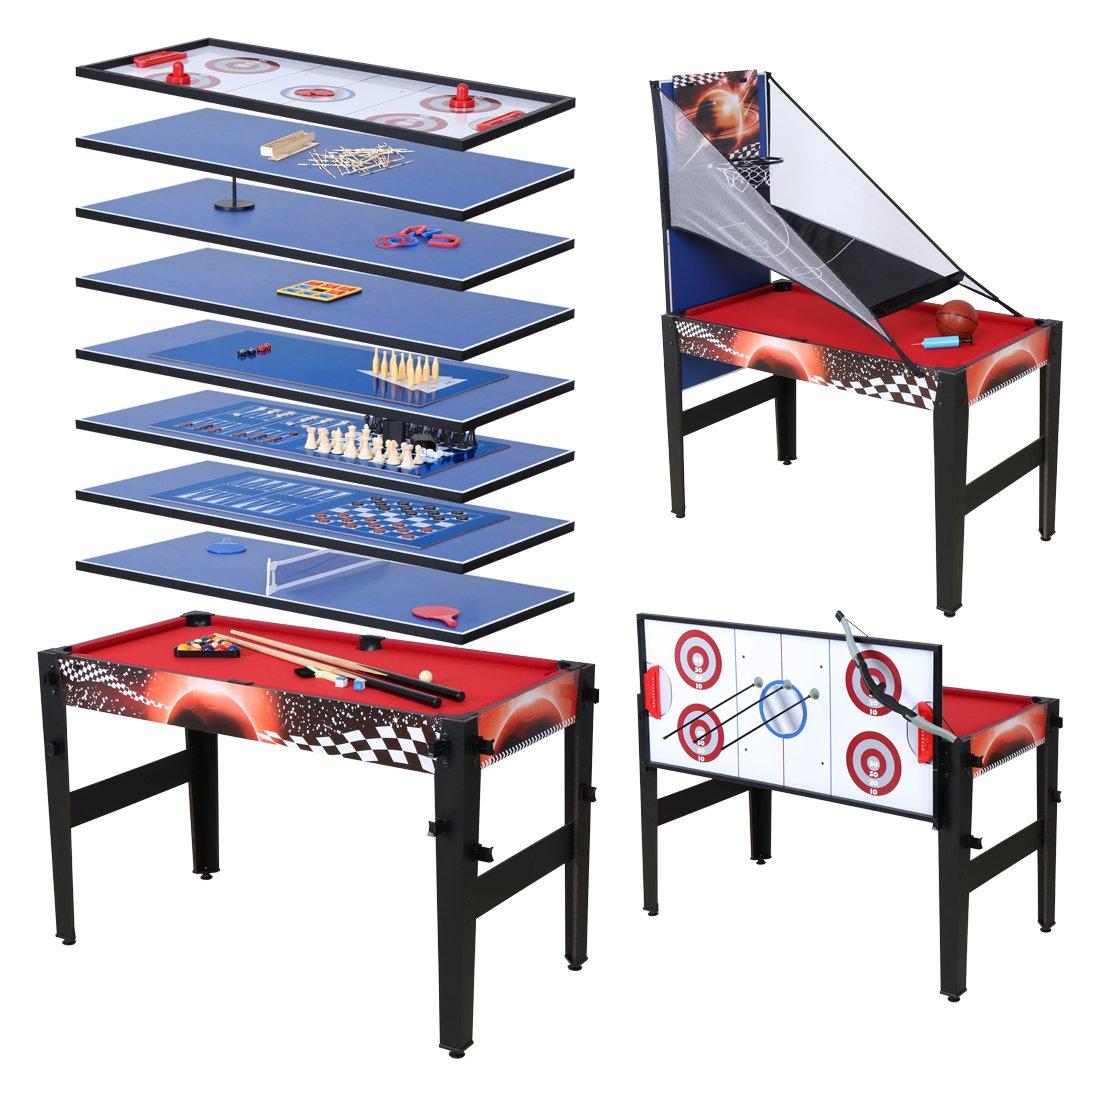 Fran_store Multi Combination Table Arcade